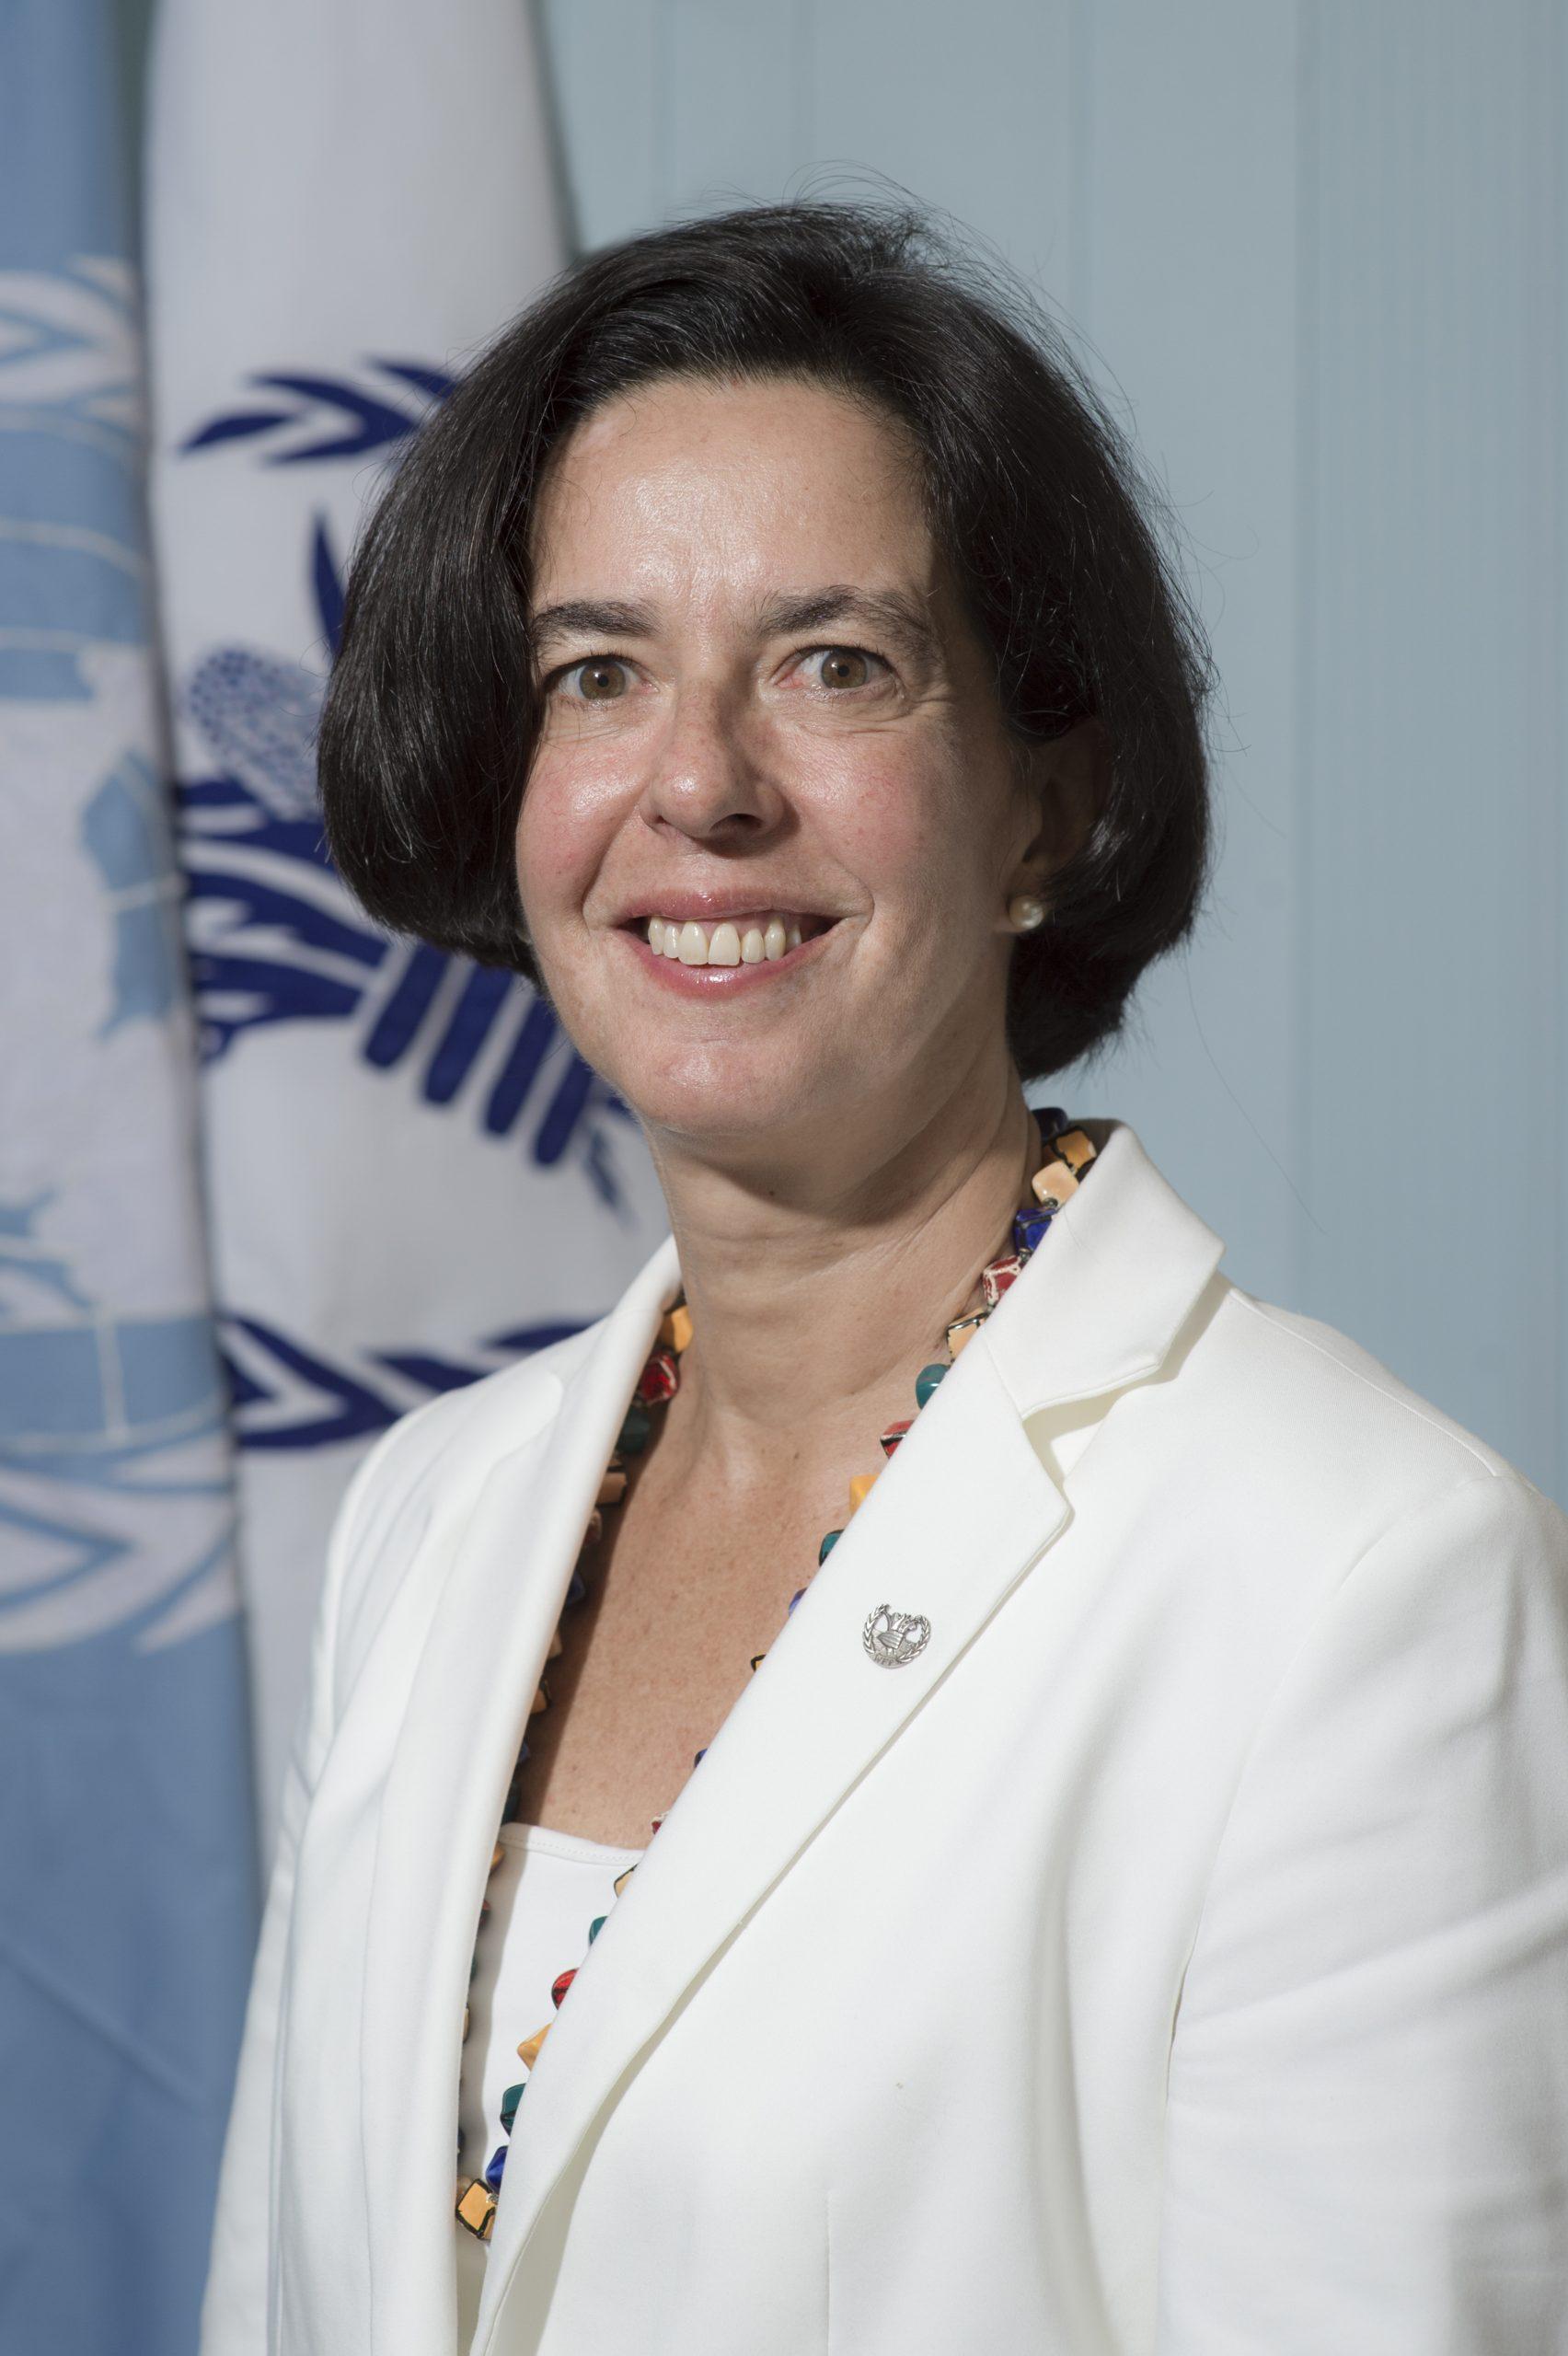 Lola Castro